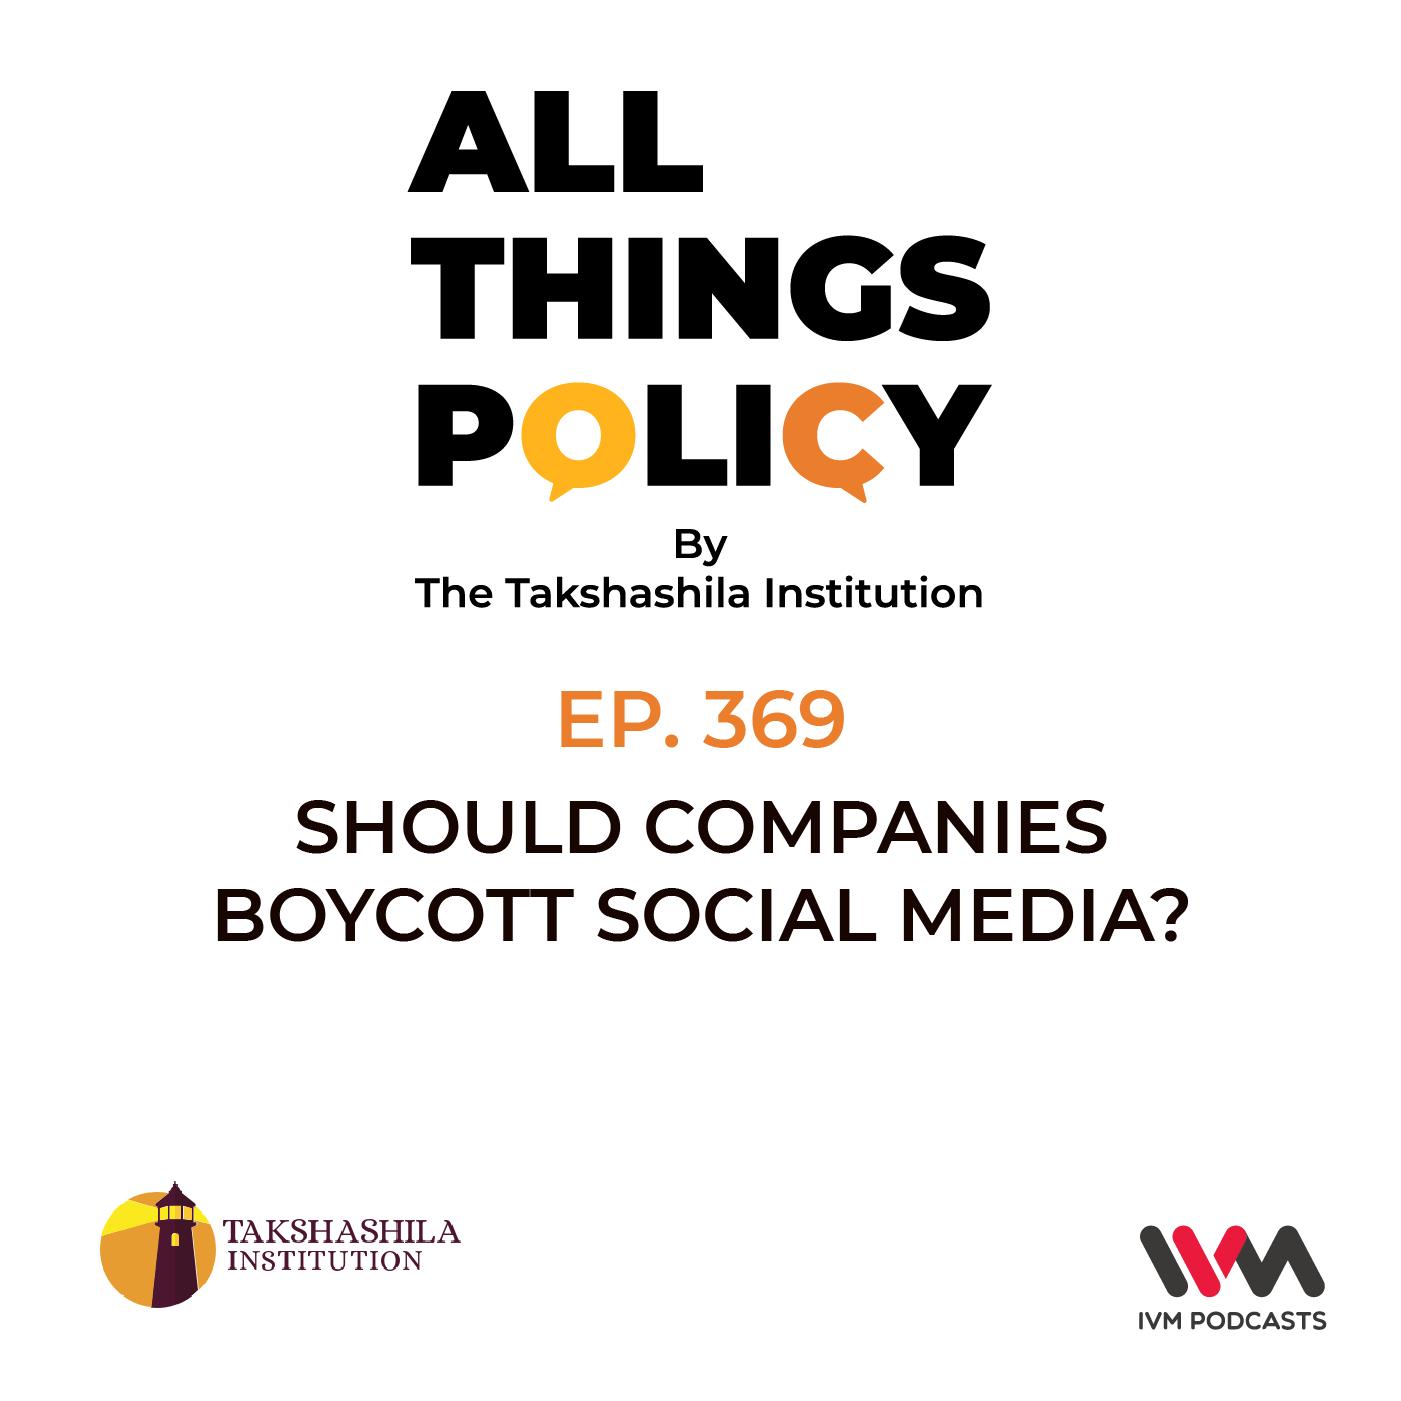 Ep. 369: Should Companies Boycott Social Media?